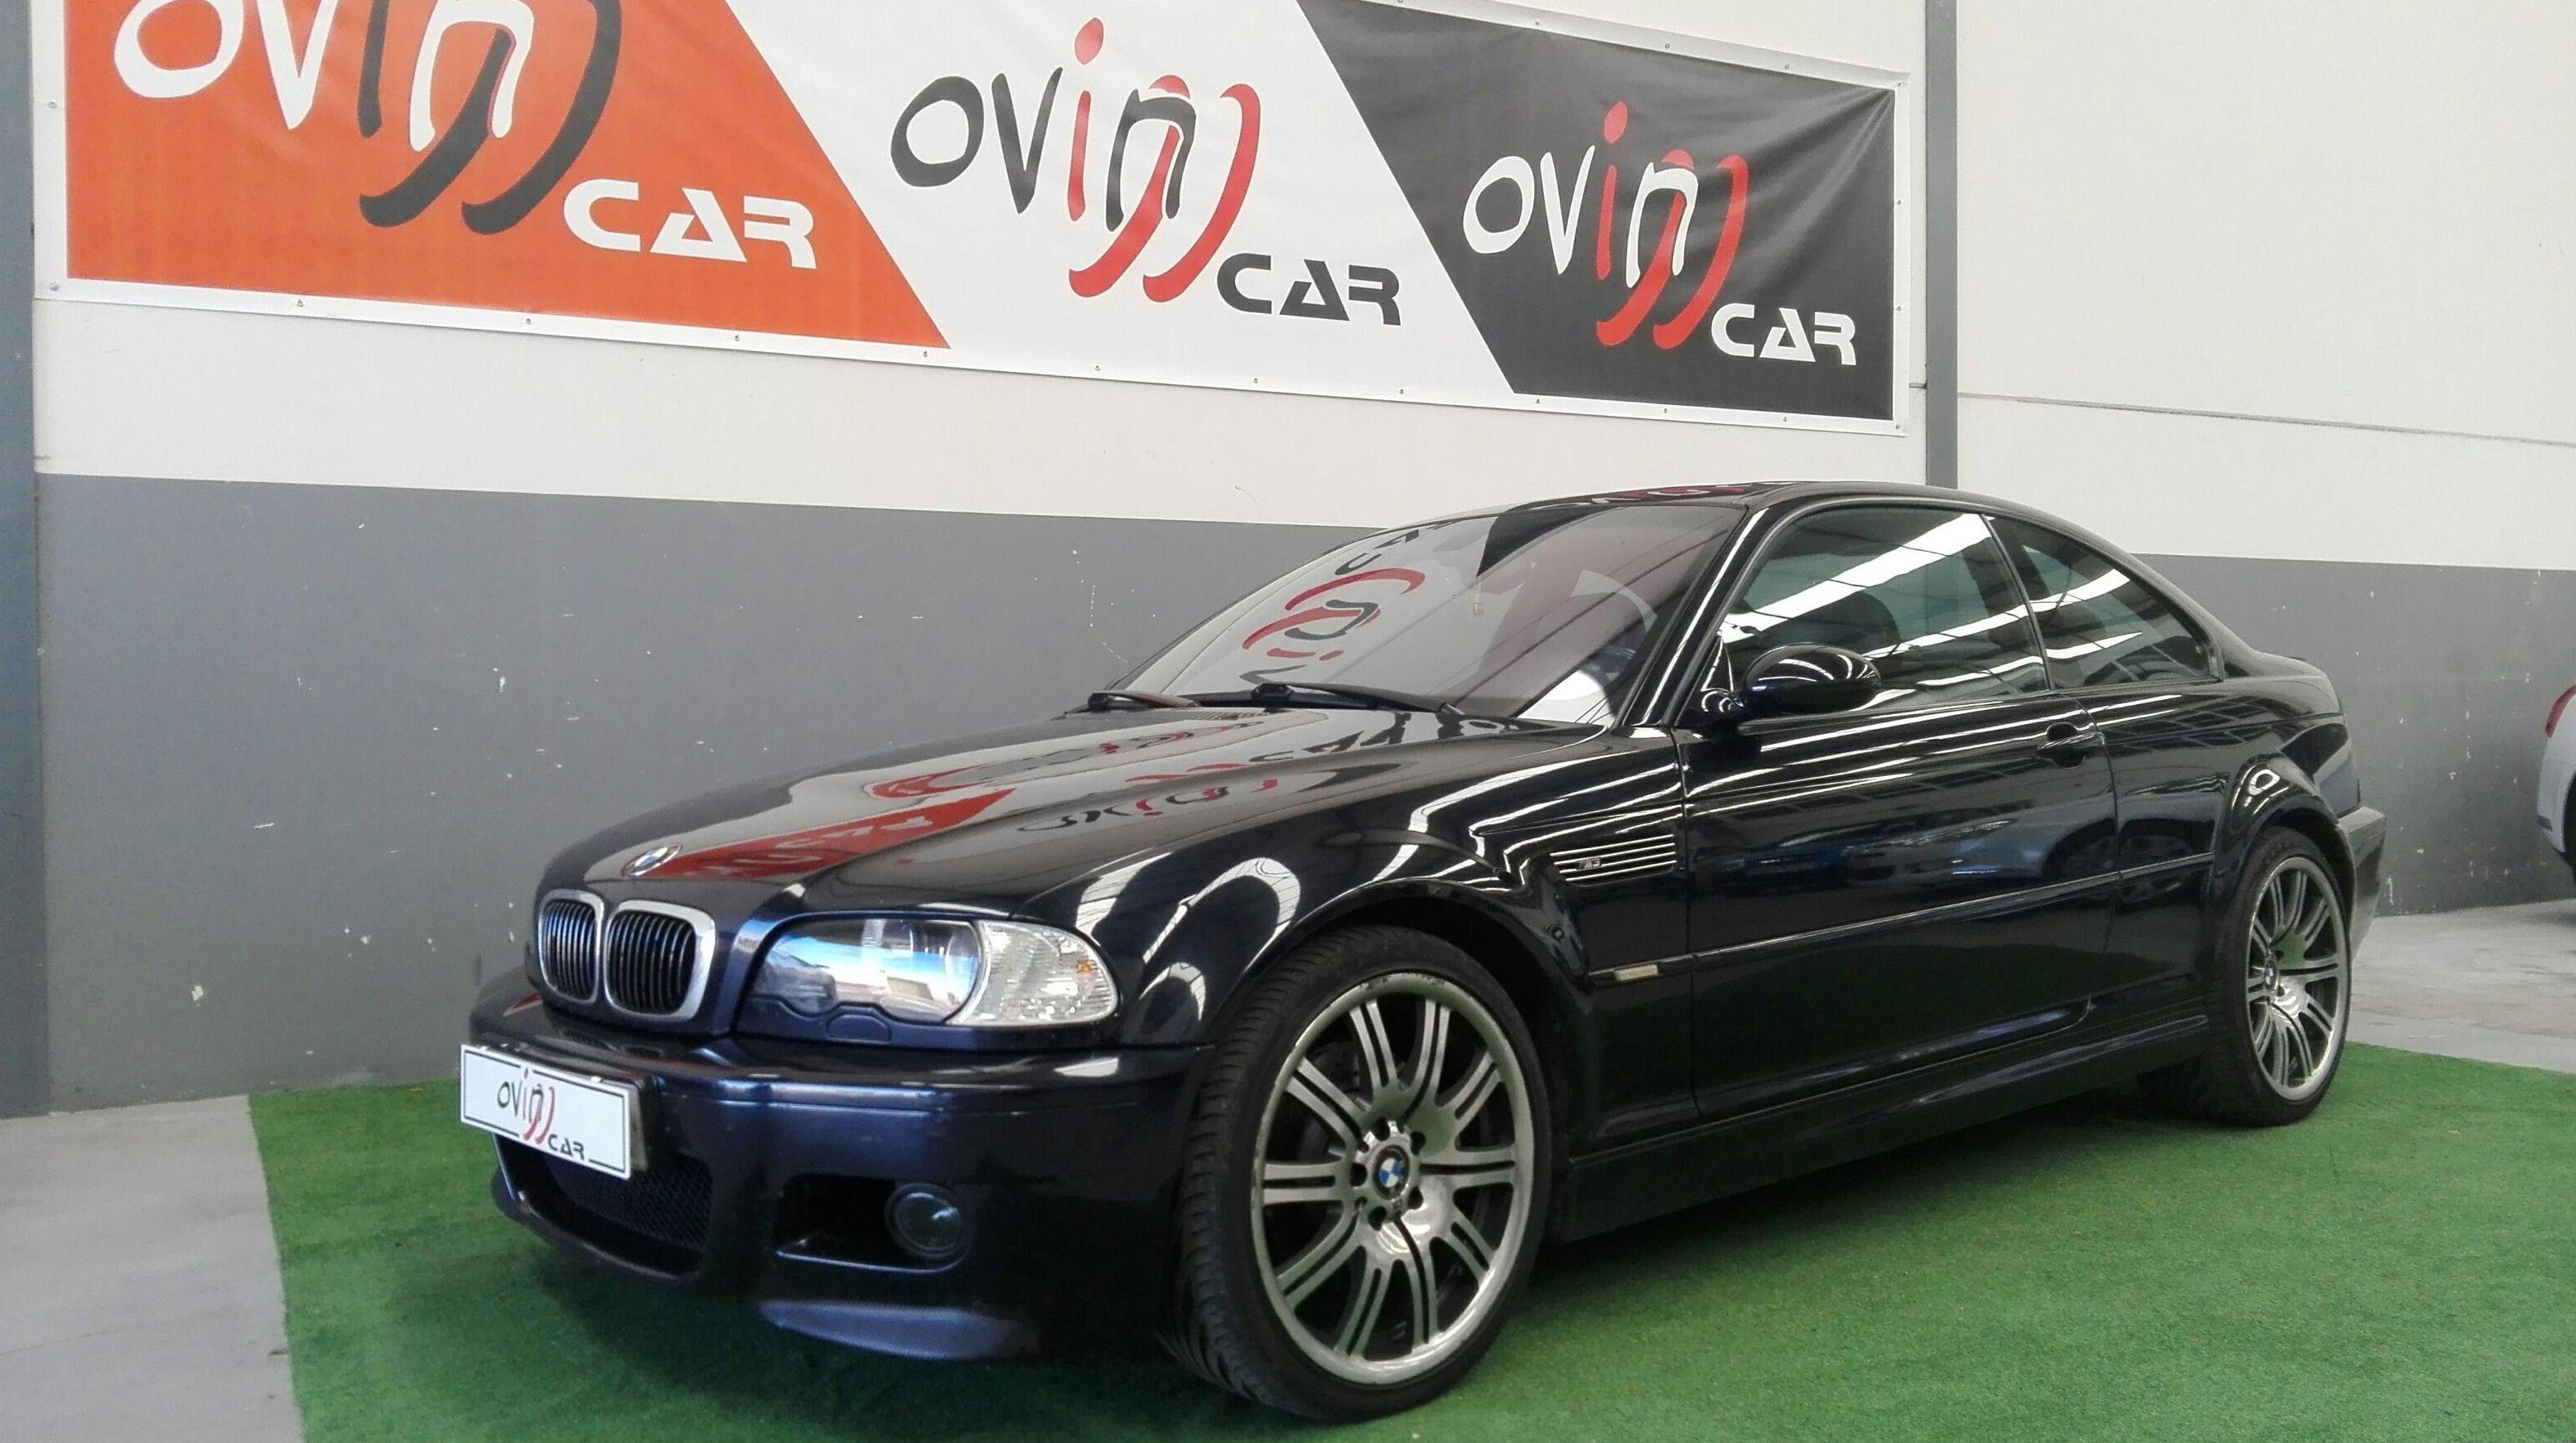 M 3 : Venta de coches de Ovincar